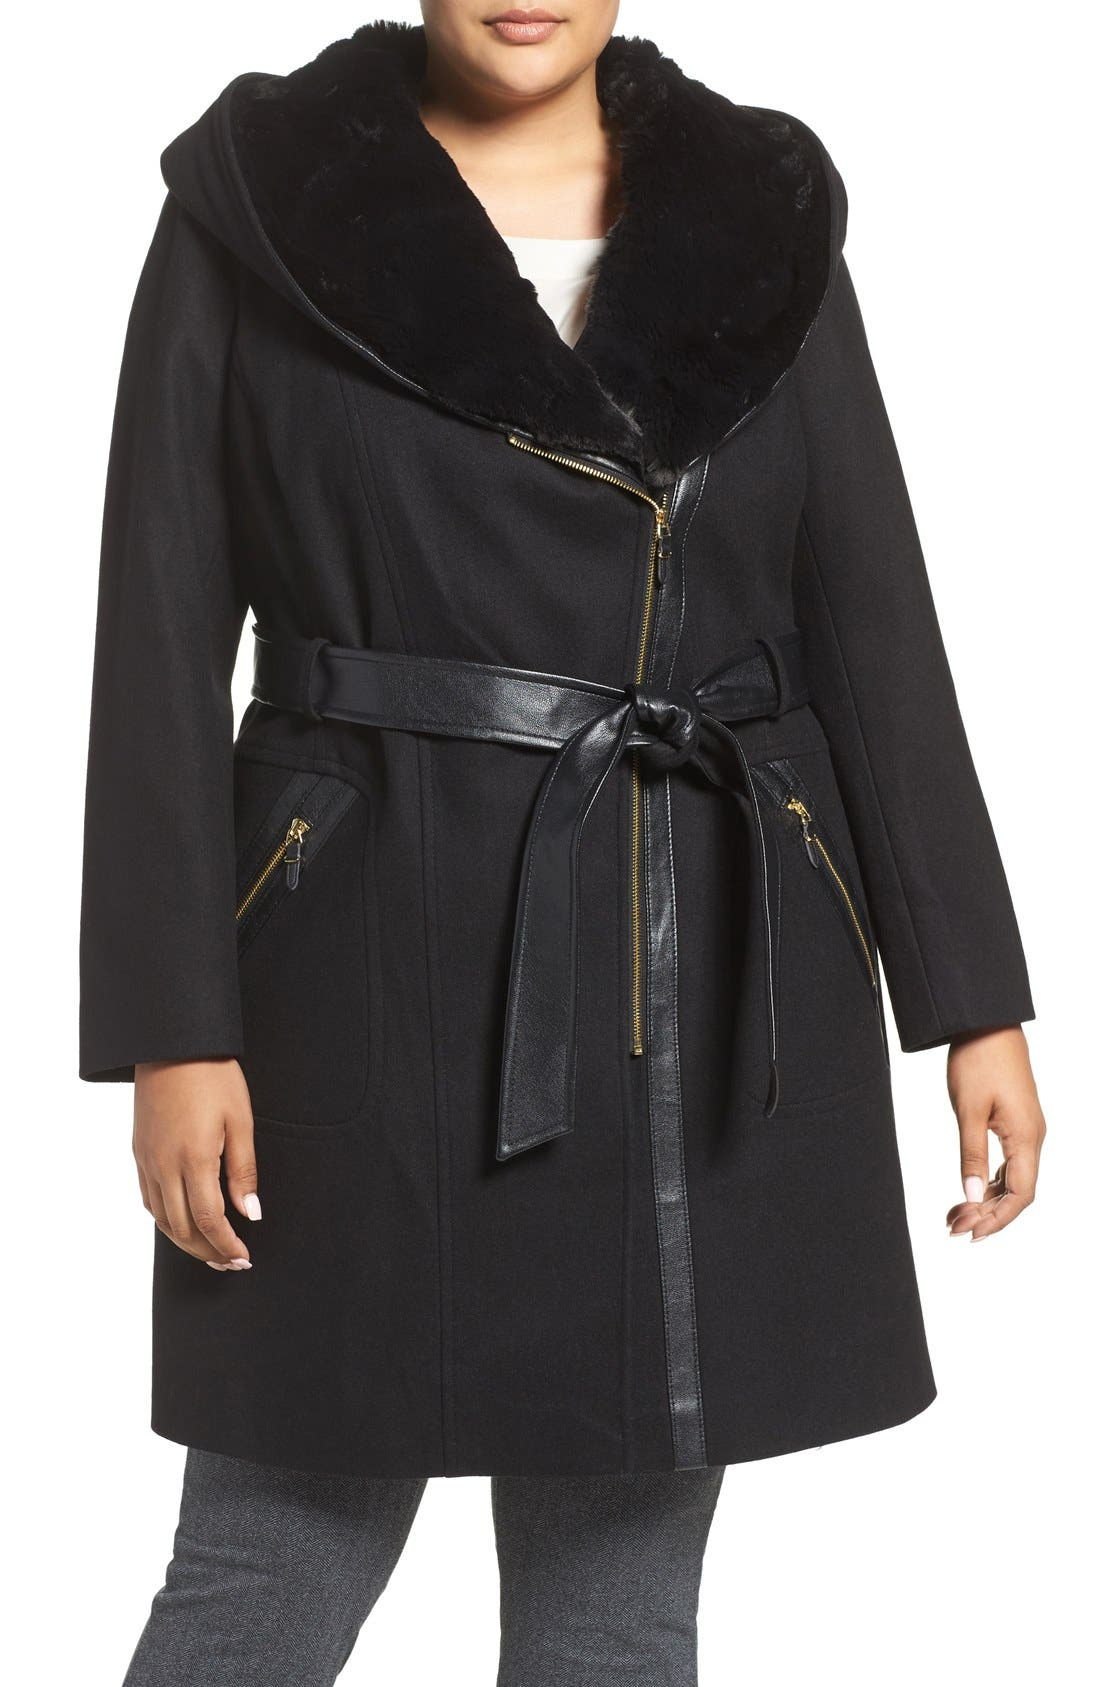 VIA SPIGA, Wool Blend Coat with Faux Fur Trim, Main thumbnail 1, color, 001